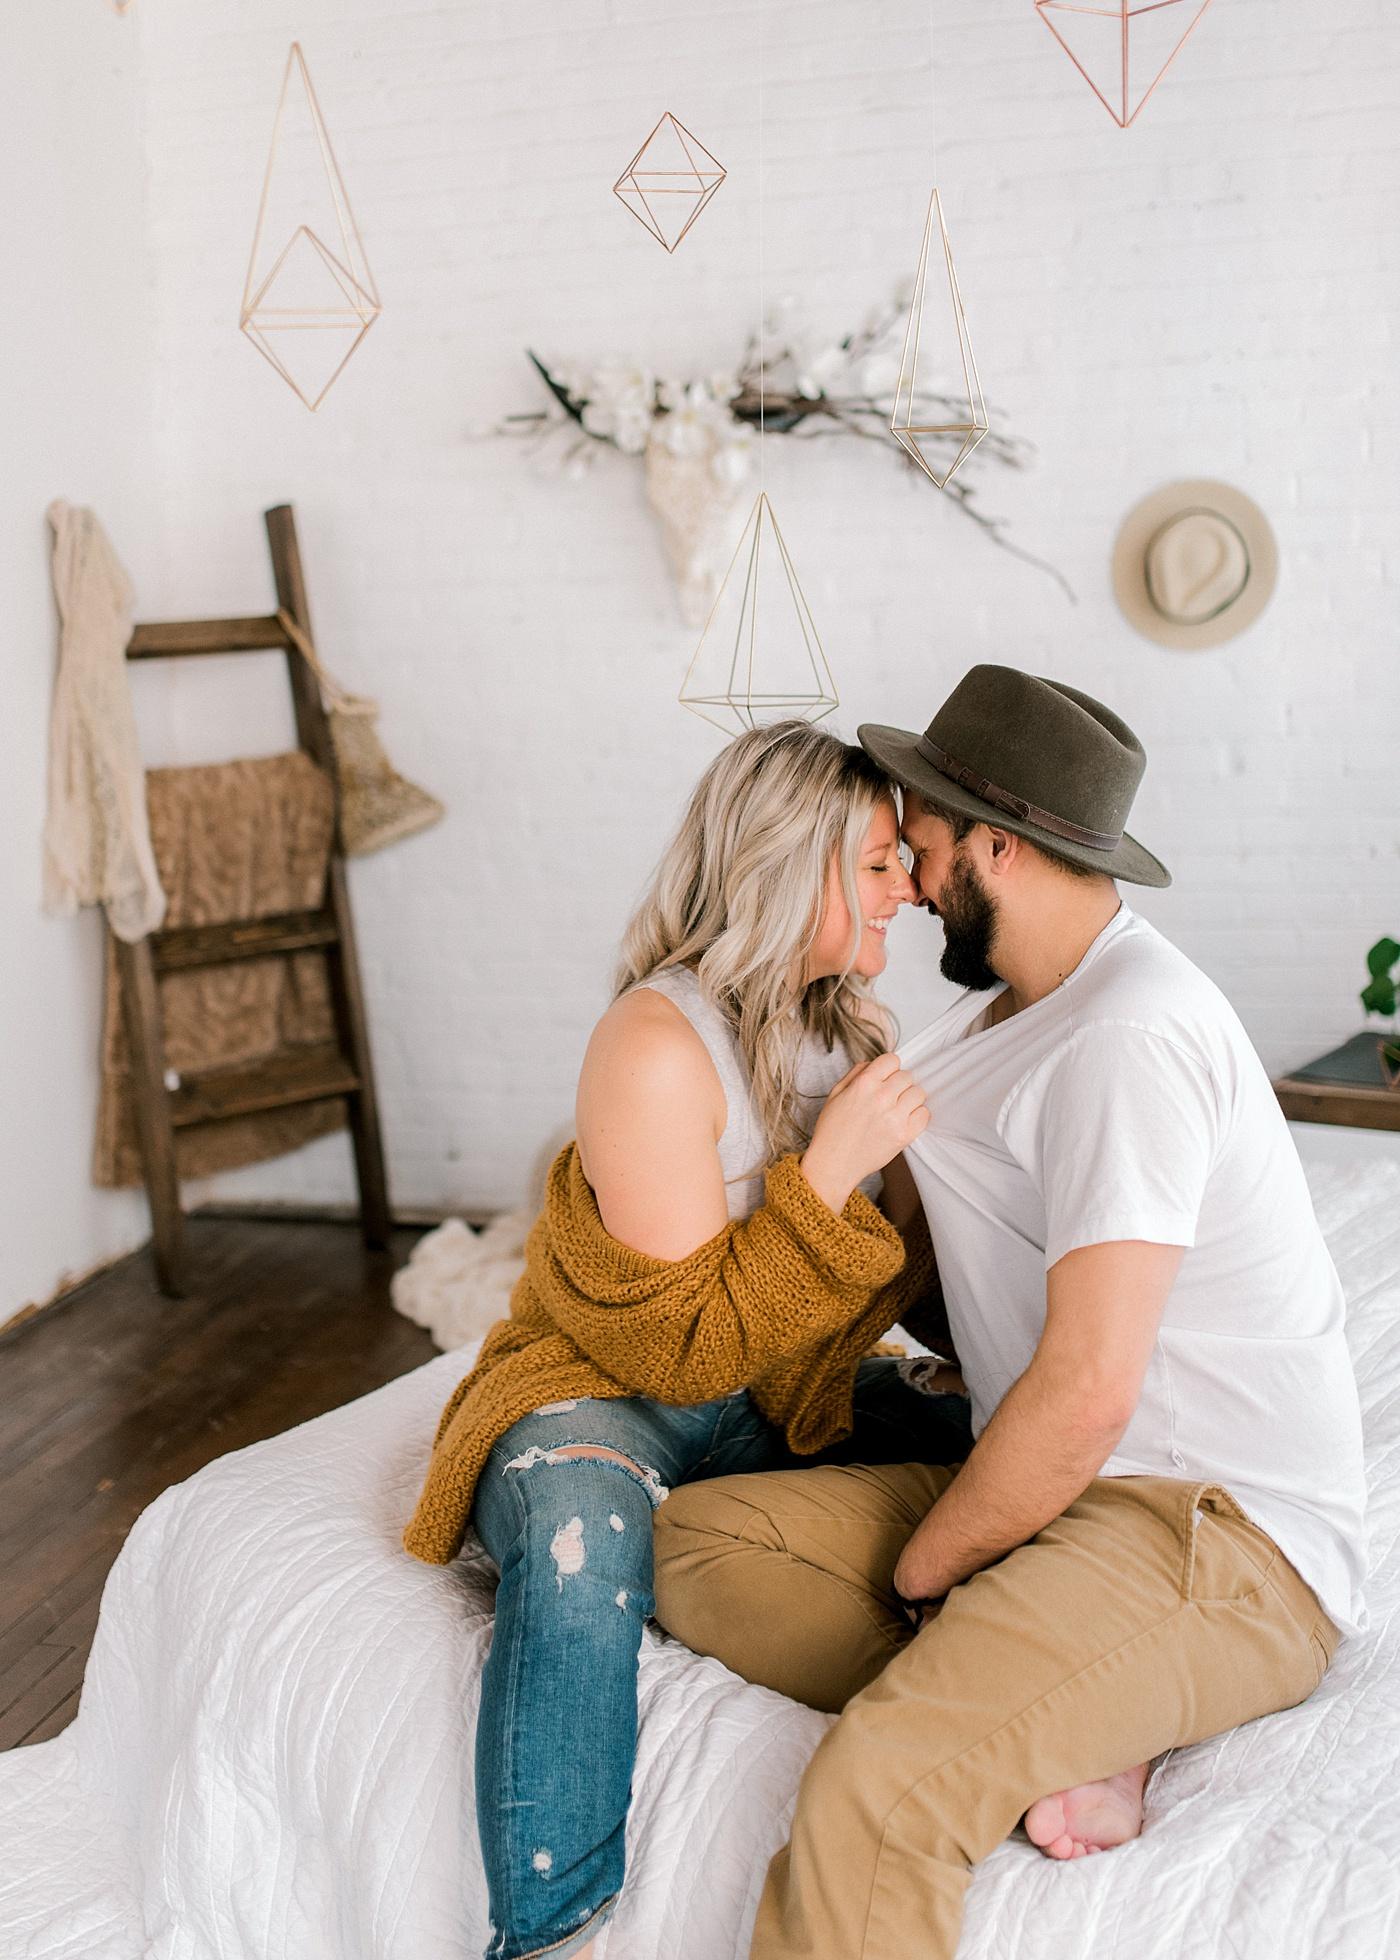 Bohemian In-Home Engagement | Barbara Rahal Photography | Edmonton Wedding Photographer | Joy Wed | Canadian Wedding Blog | Canmore Wedding Planner | Stacey Foley Design